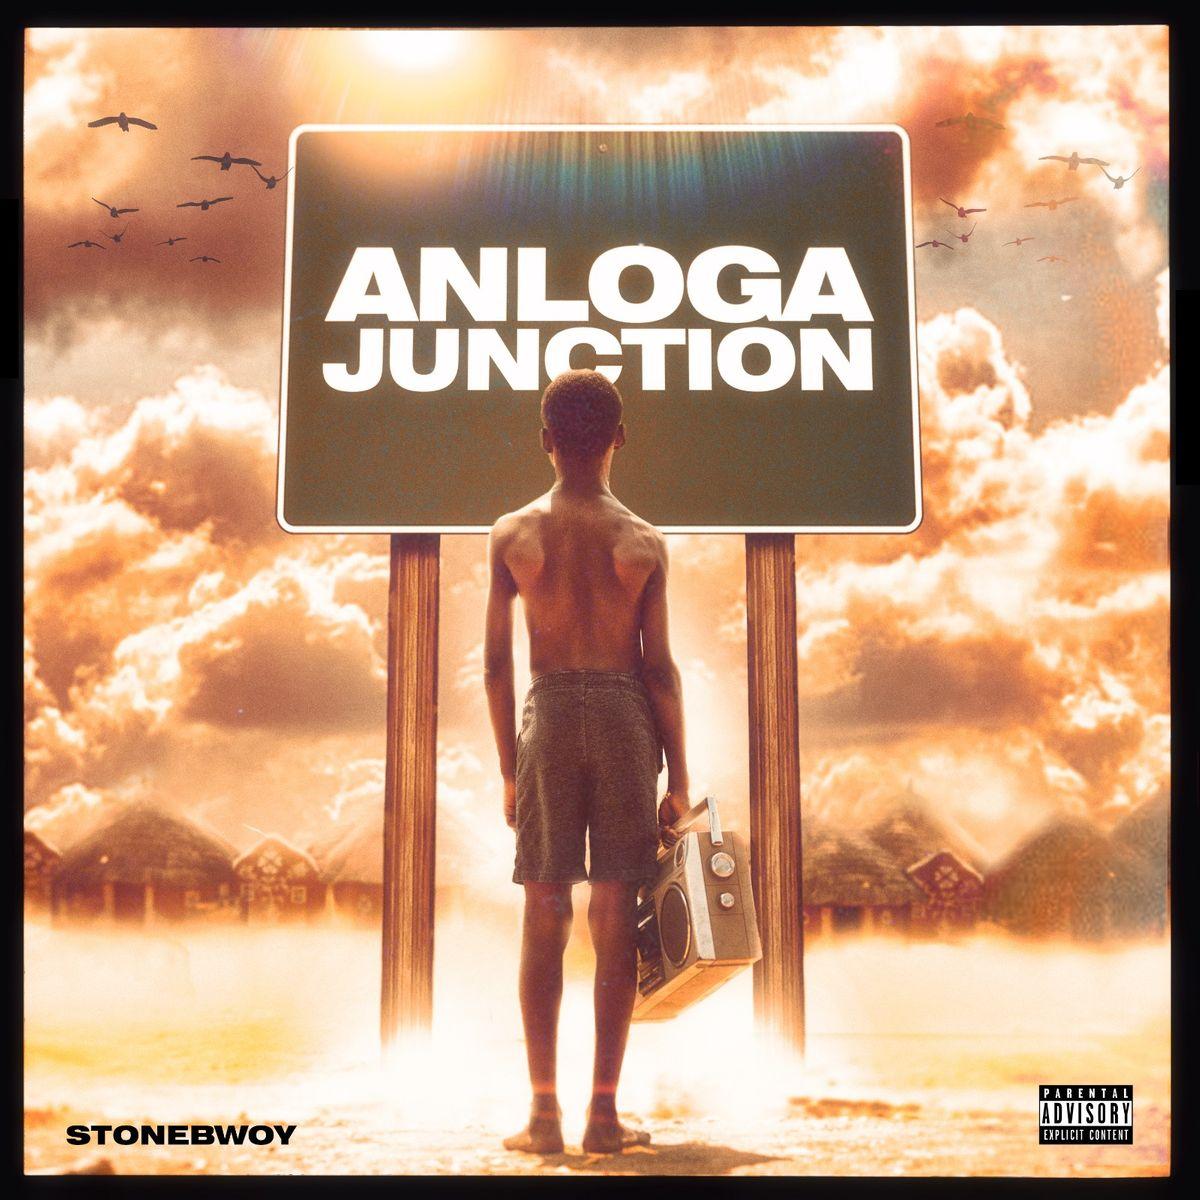 Stonebwoy - Anloga Junction (Full Album)